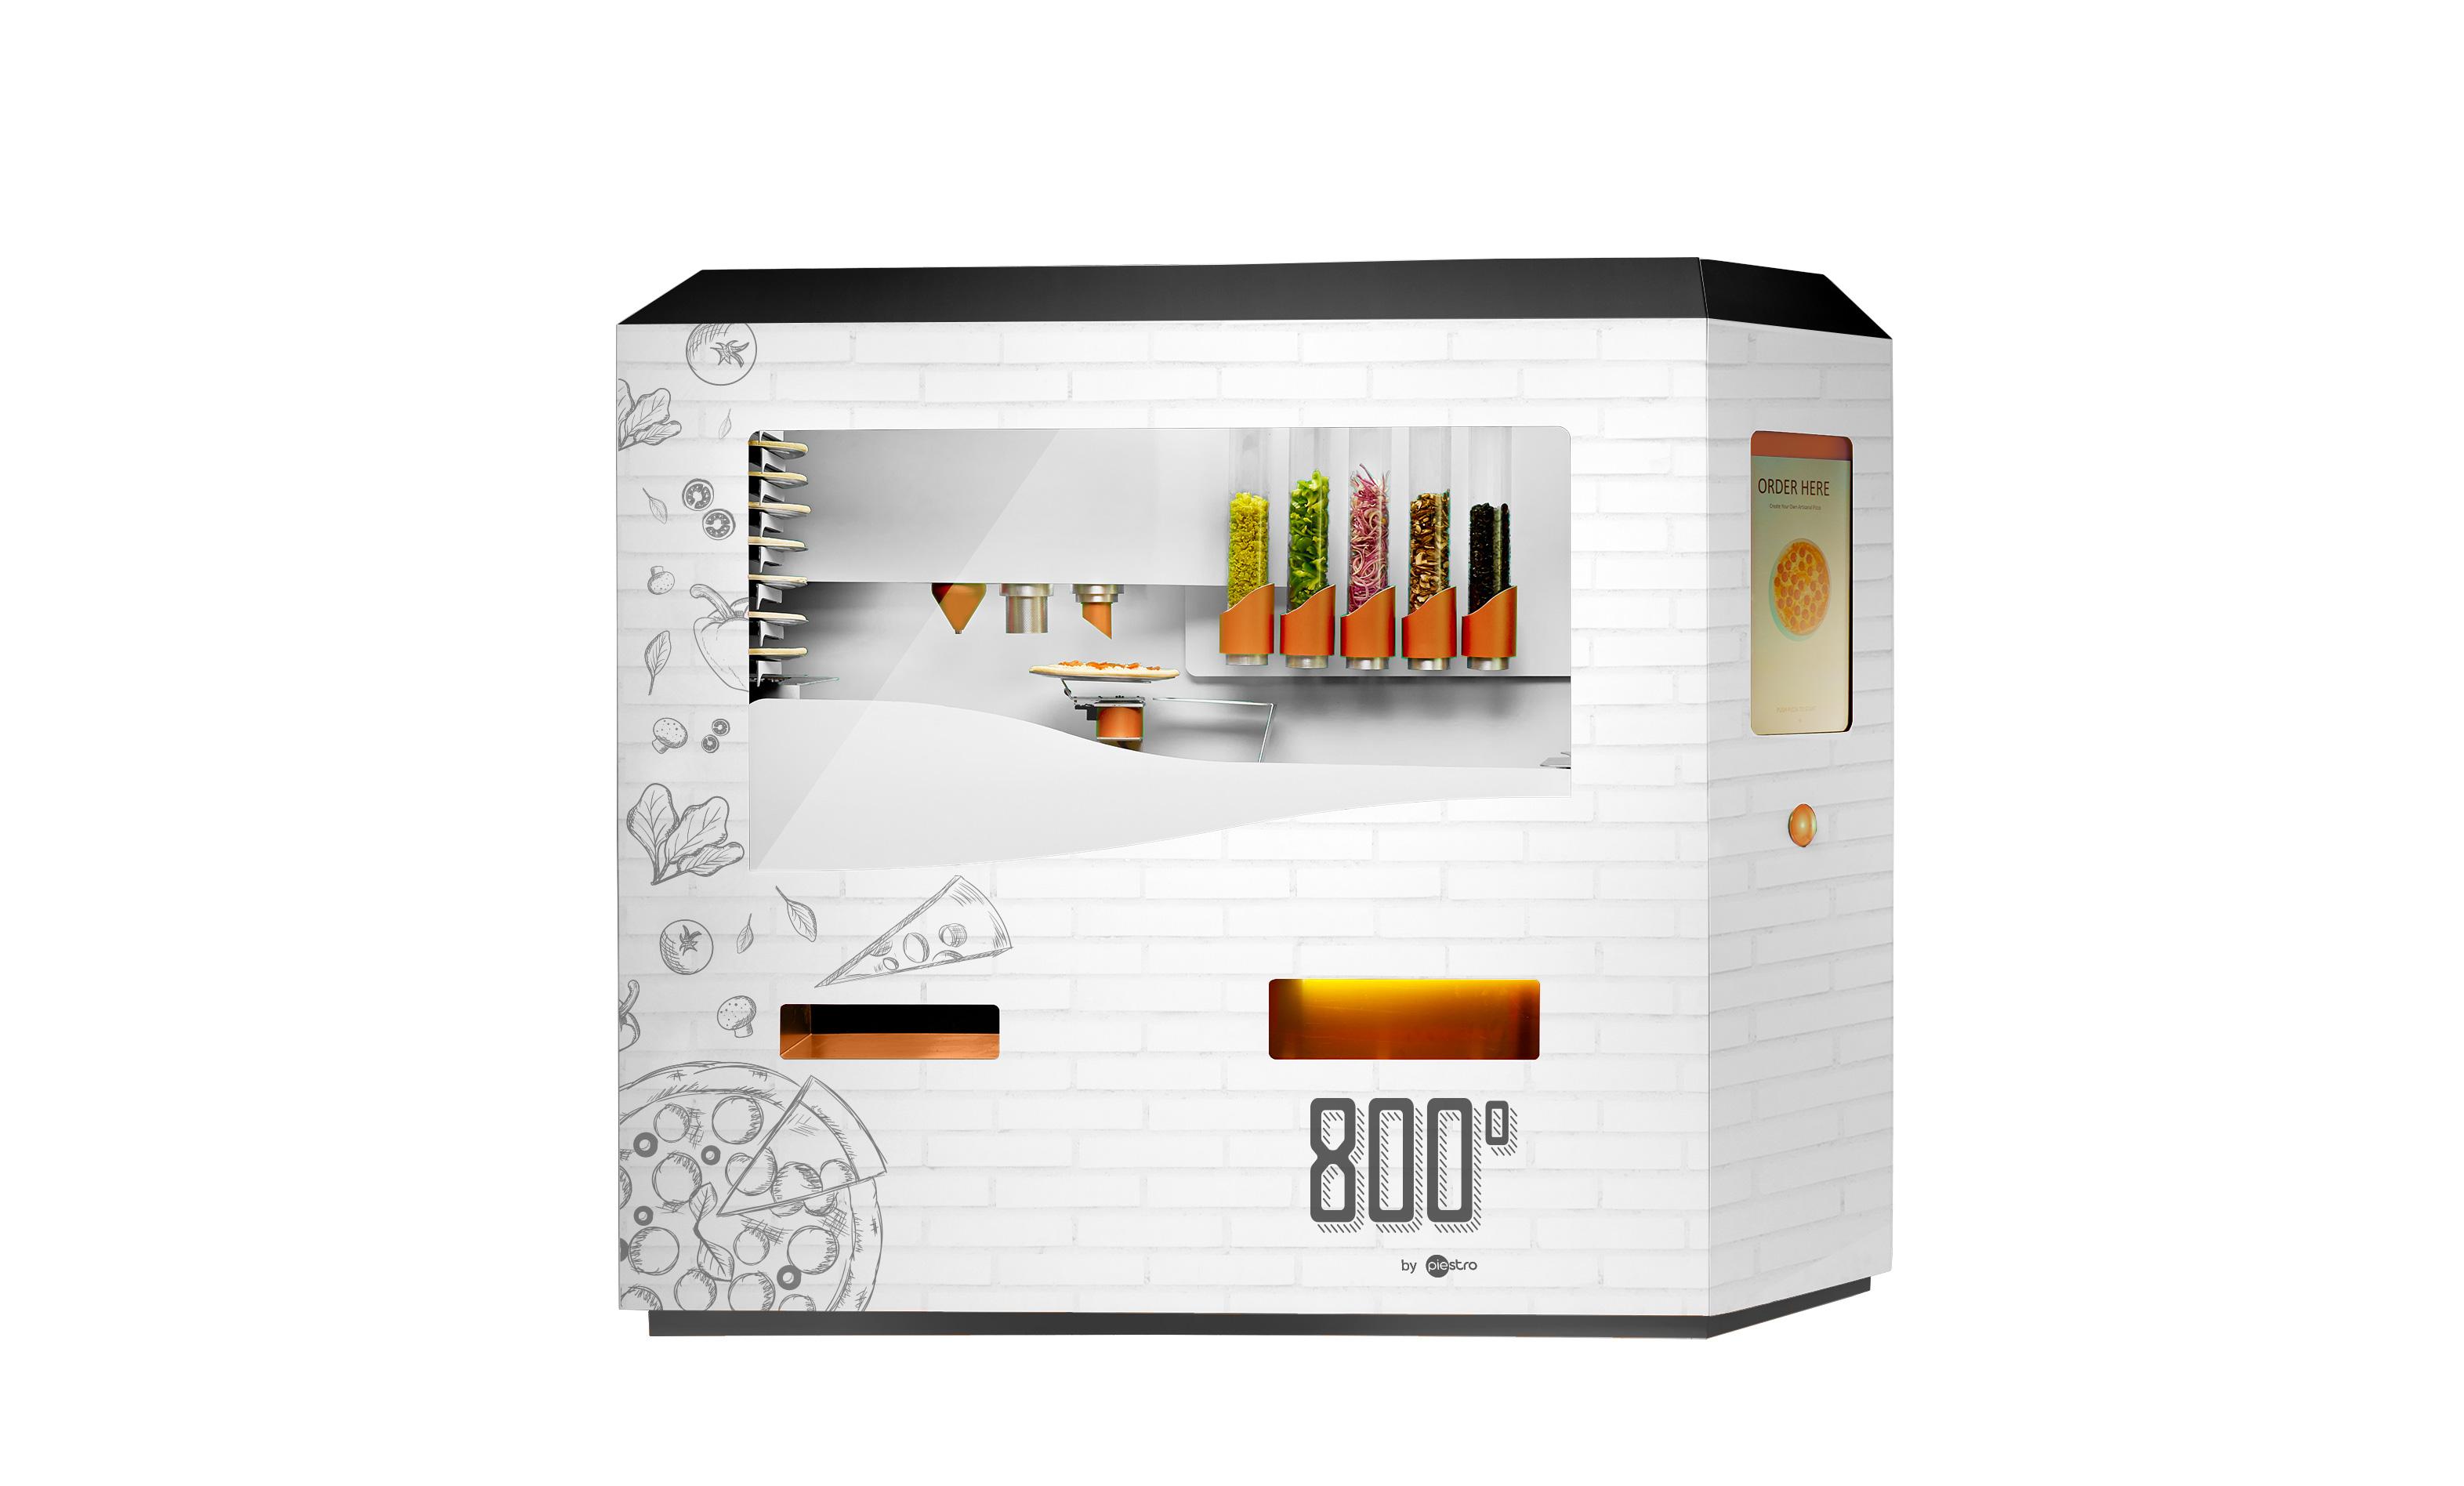 800 Degrees by Piestro machine